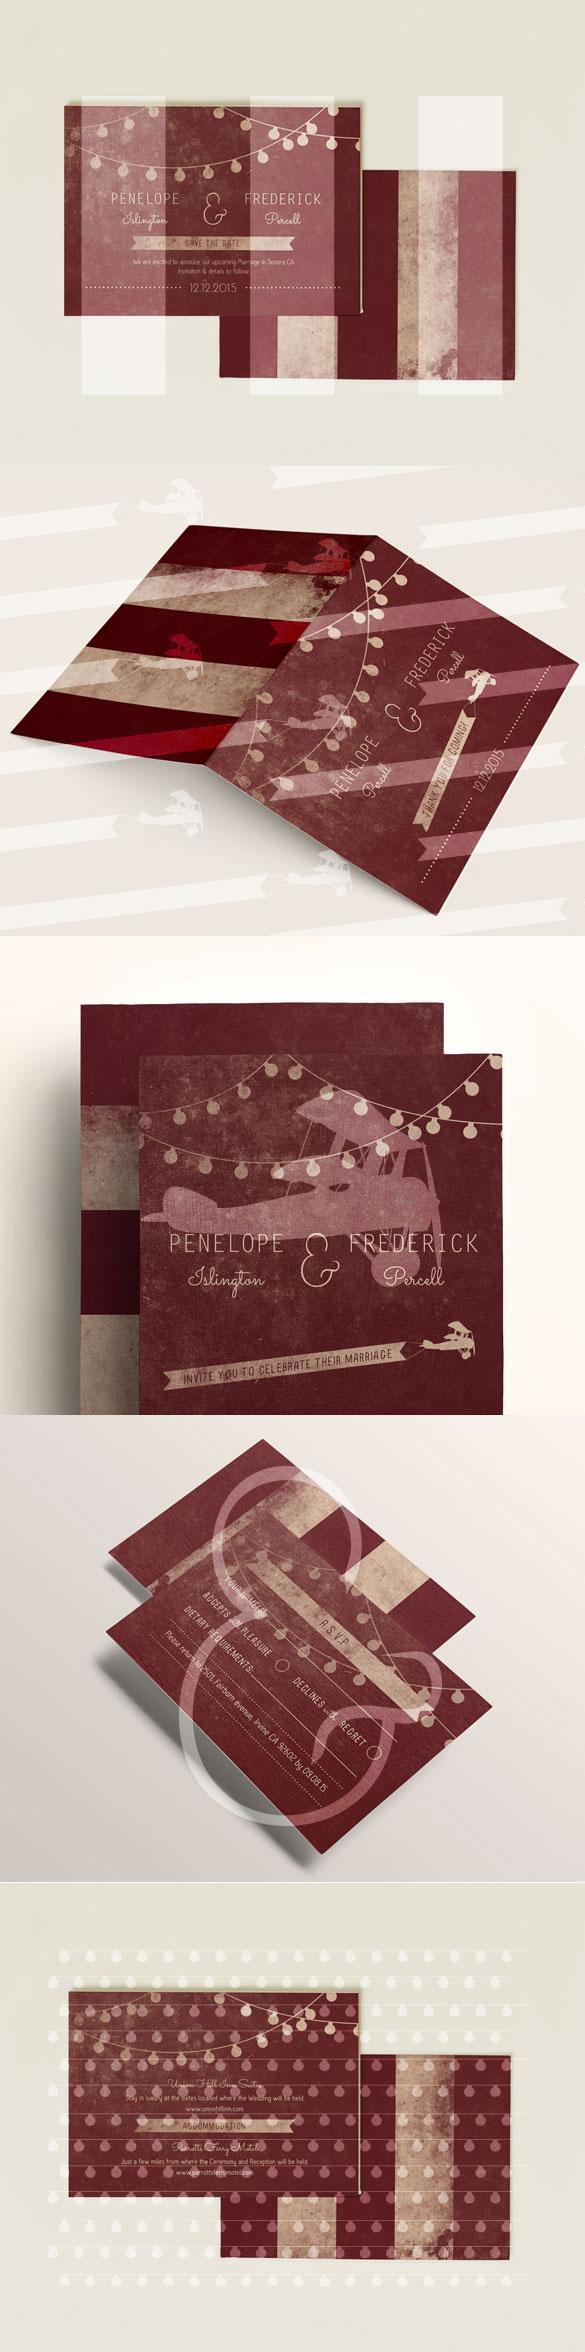 DIY Printable Wedding Invitation & Stationery Set Garland Cream ...